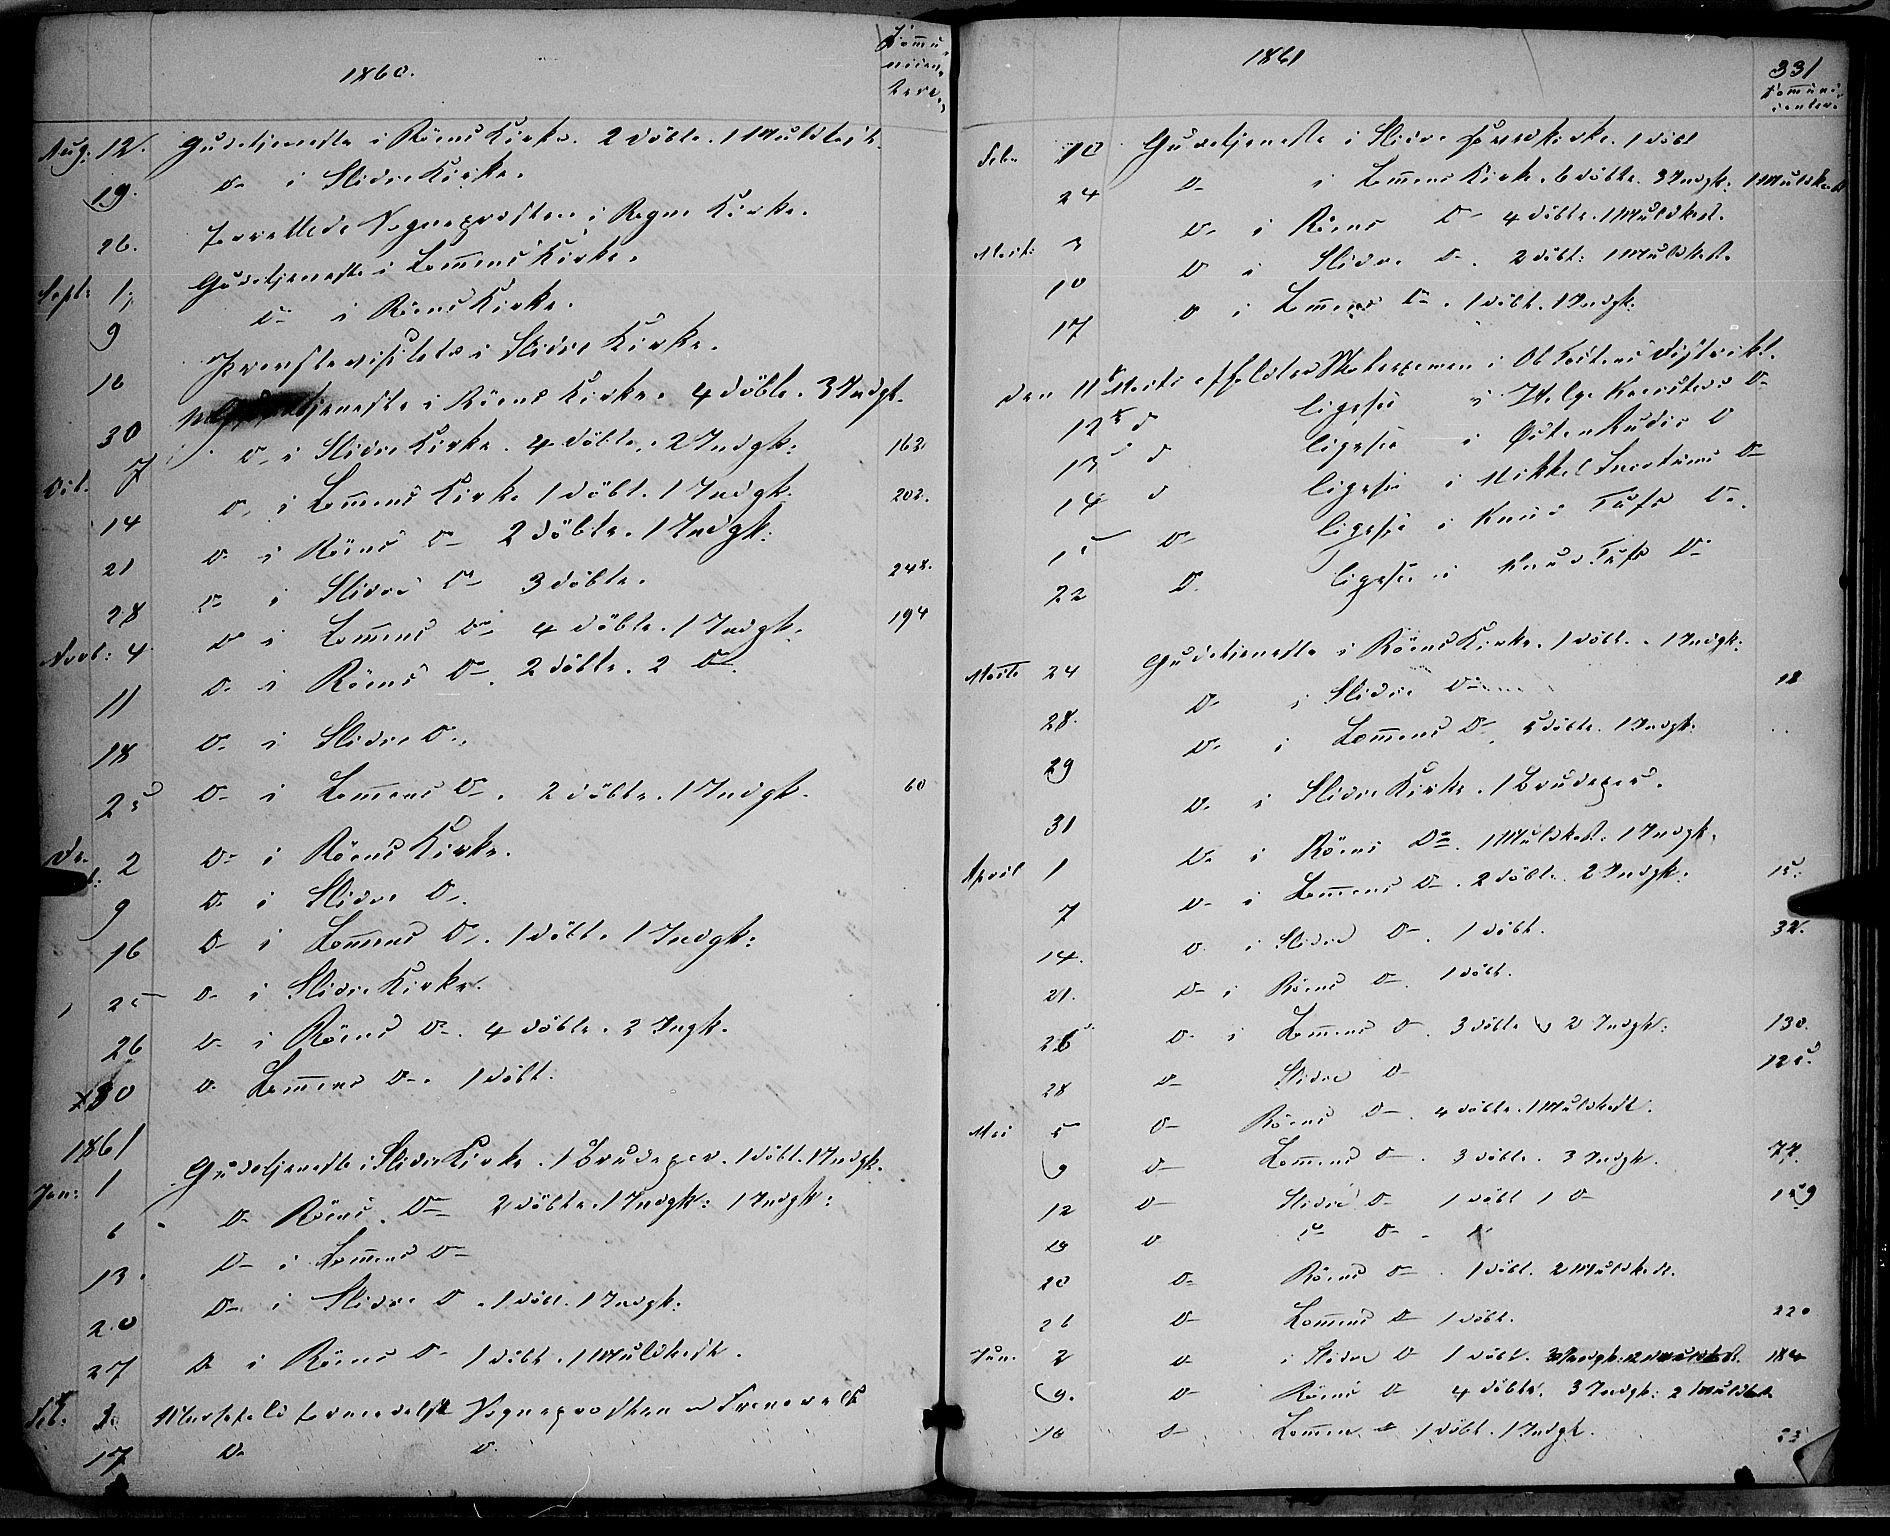 SAH, Vestre Slidre prestekontor, Ministerialbok nr. 2, 1856-1864, s. 331